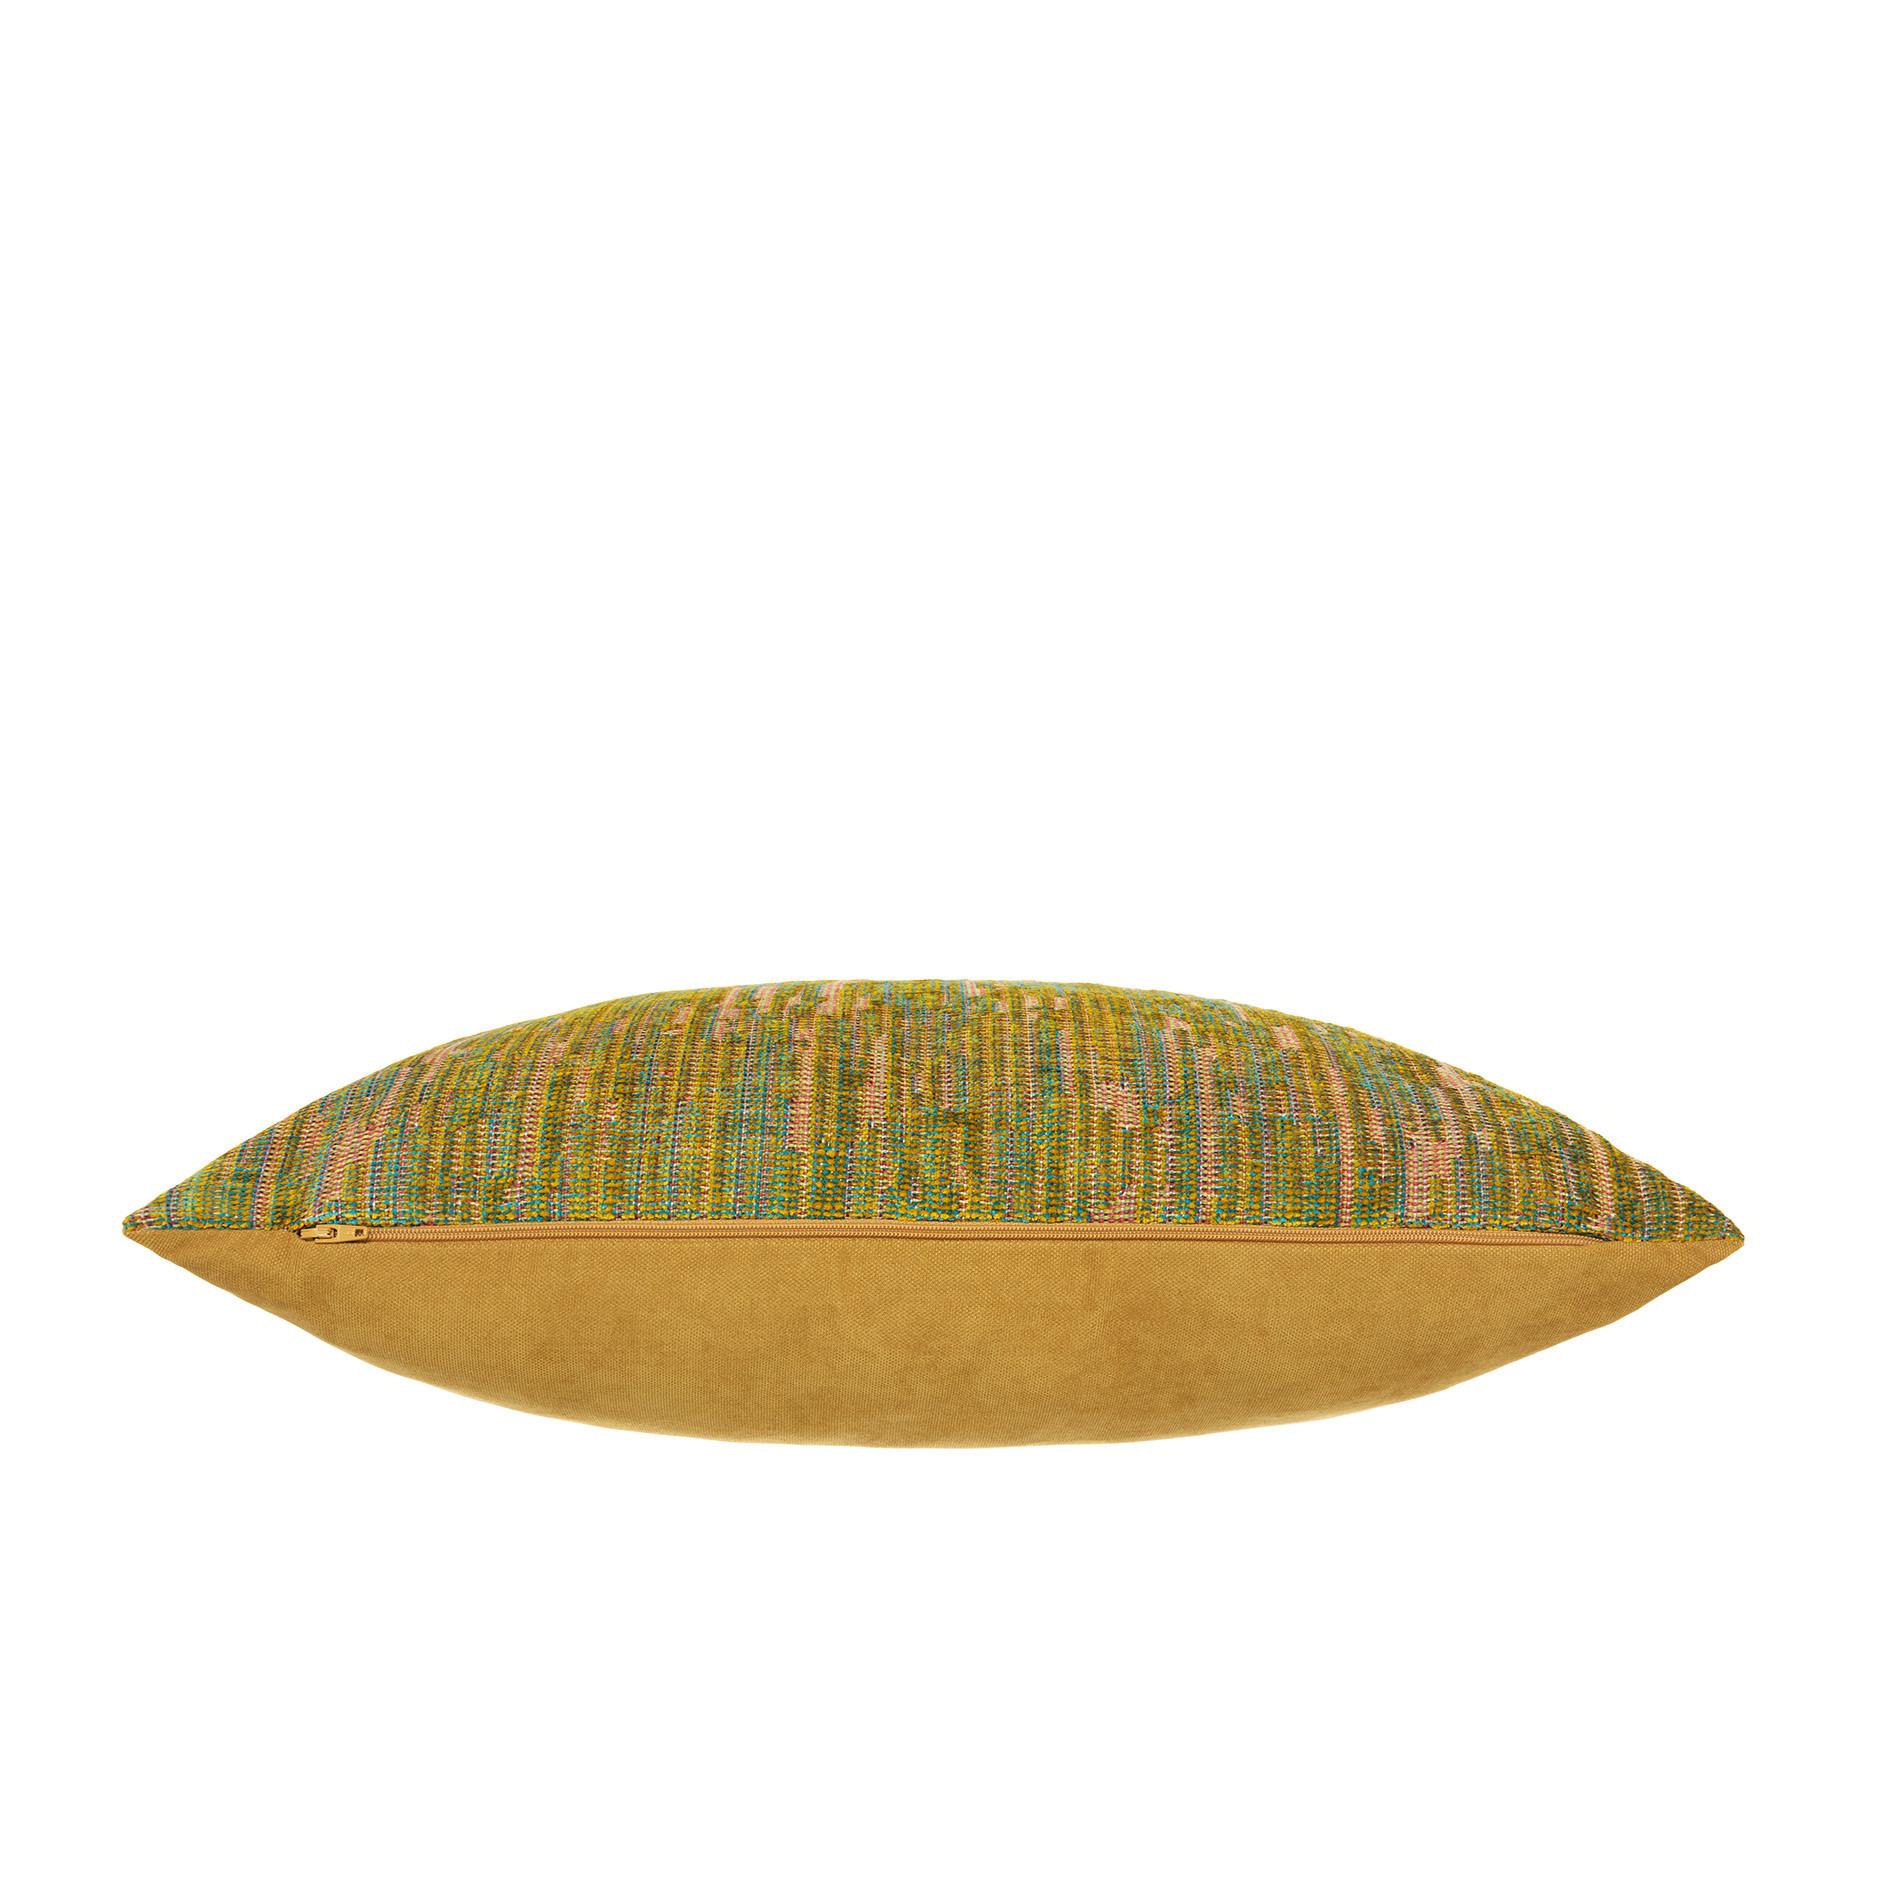 Cuscino jacquard motivo multicolore 50x50cm, Giallo senape, large image number 2